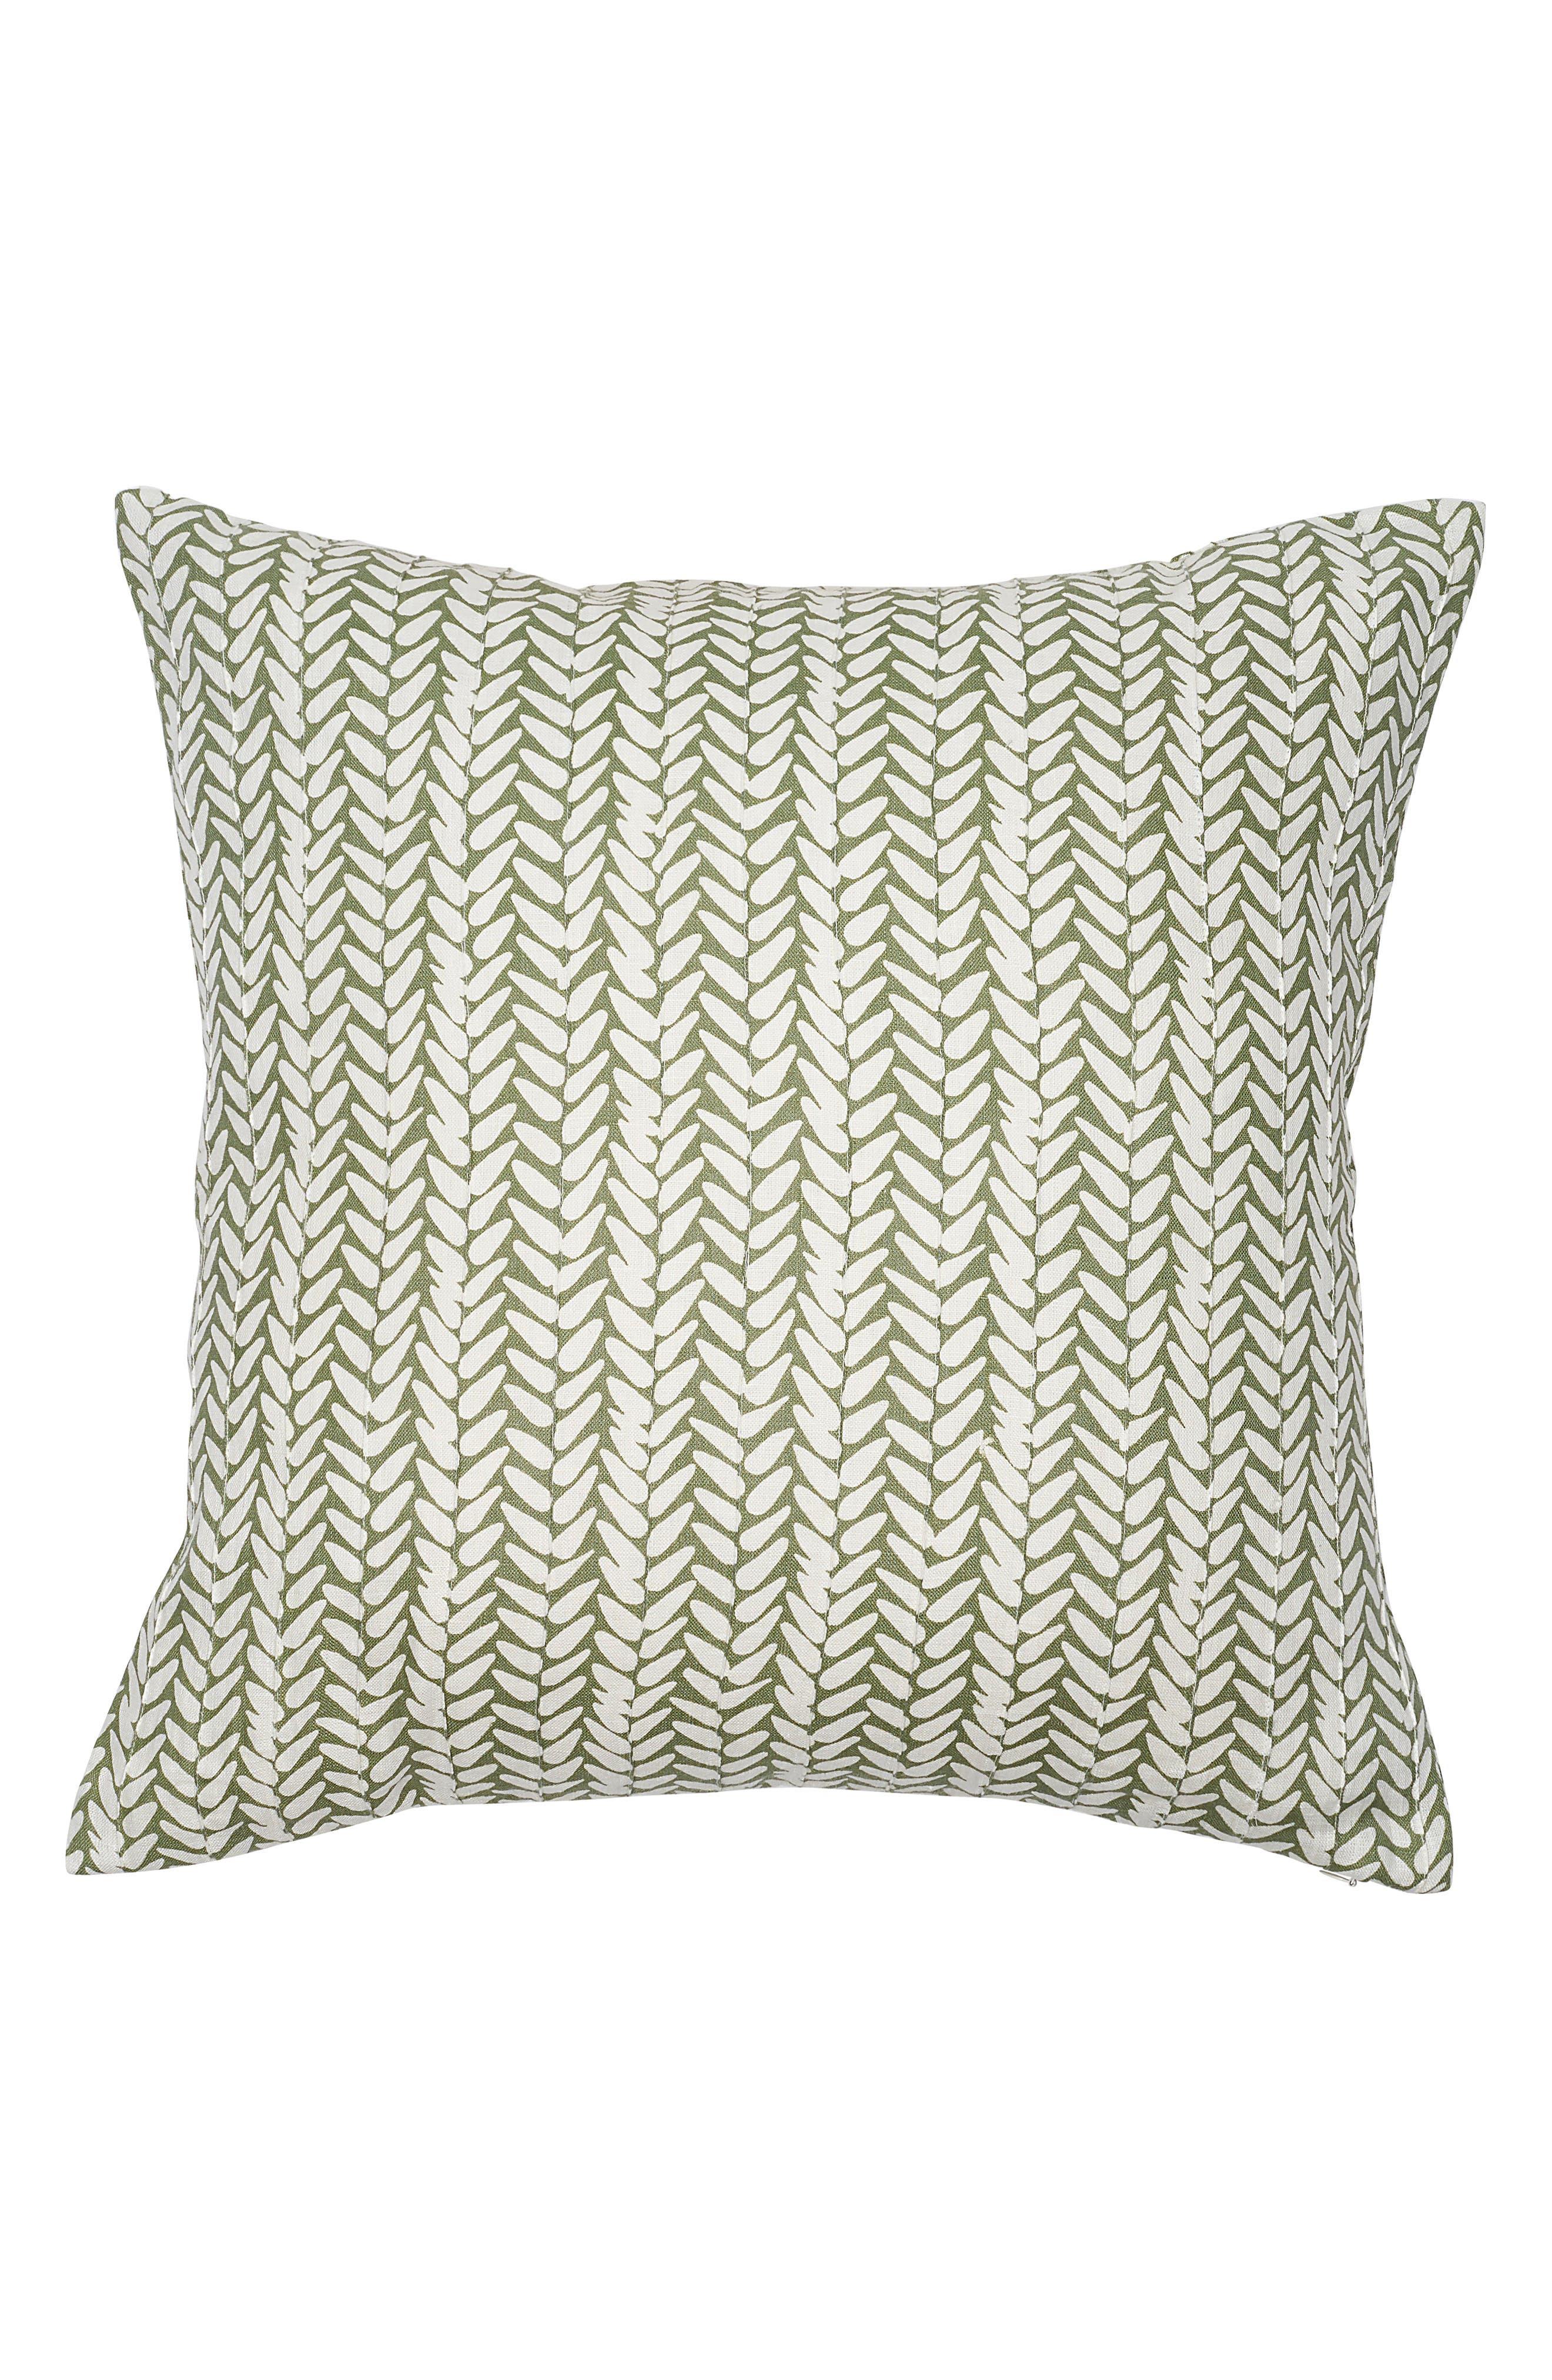 EADIE LIFESTYLE, Leaf Hand Printed Linen Accent Pillow, Main thumbnail 1, color, SAGE